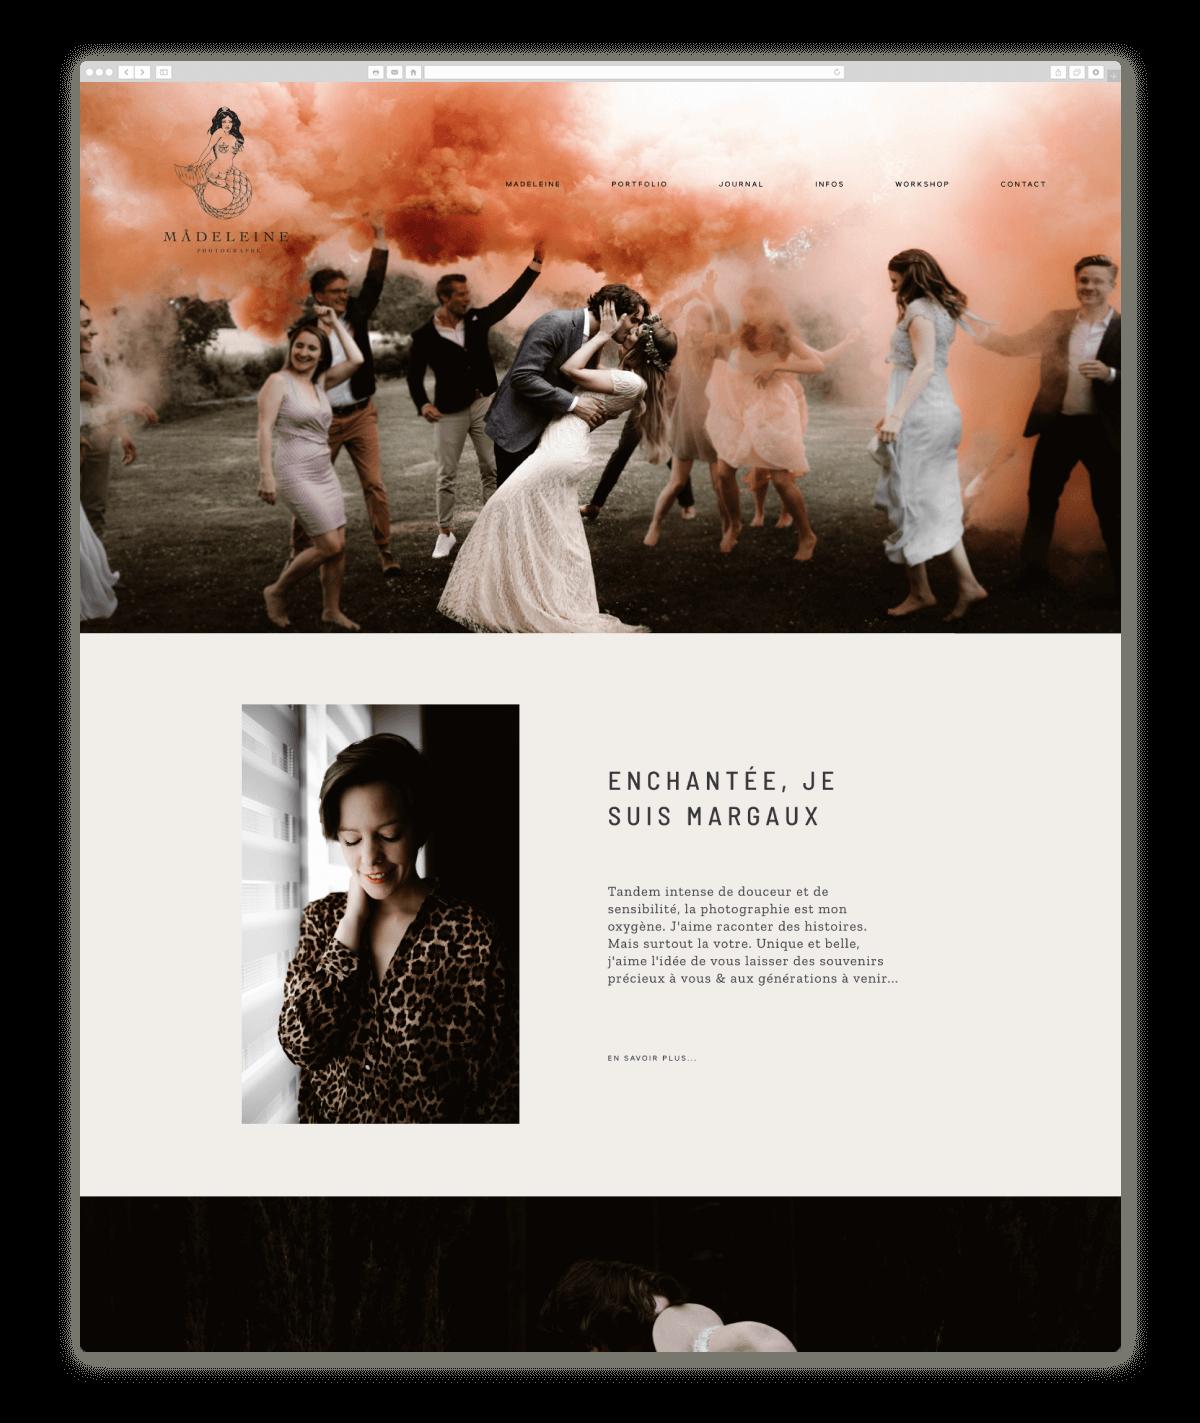 wedding photography website design  studiomadeleine.fr